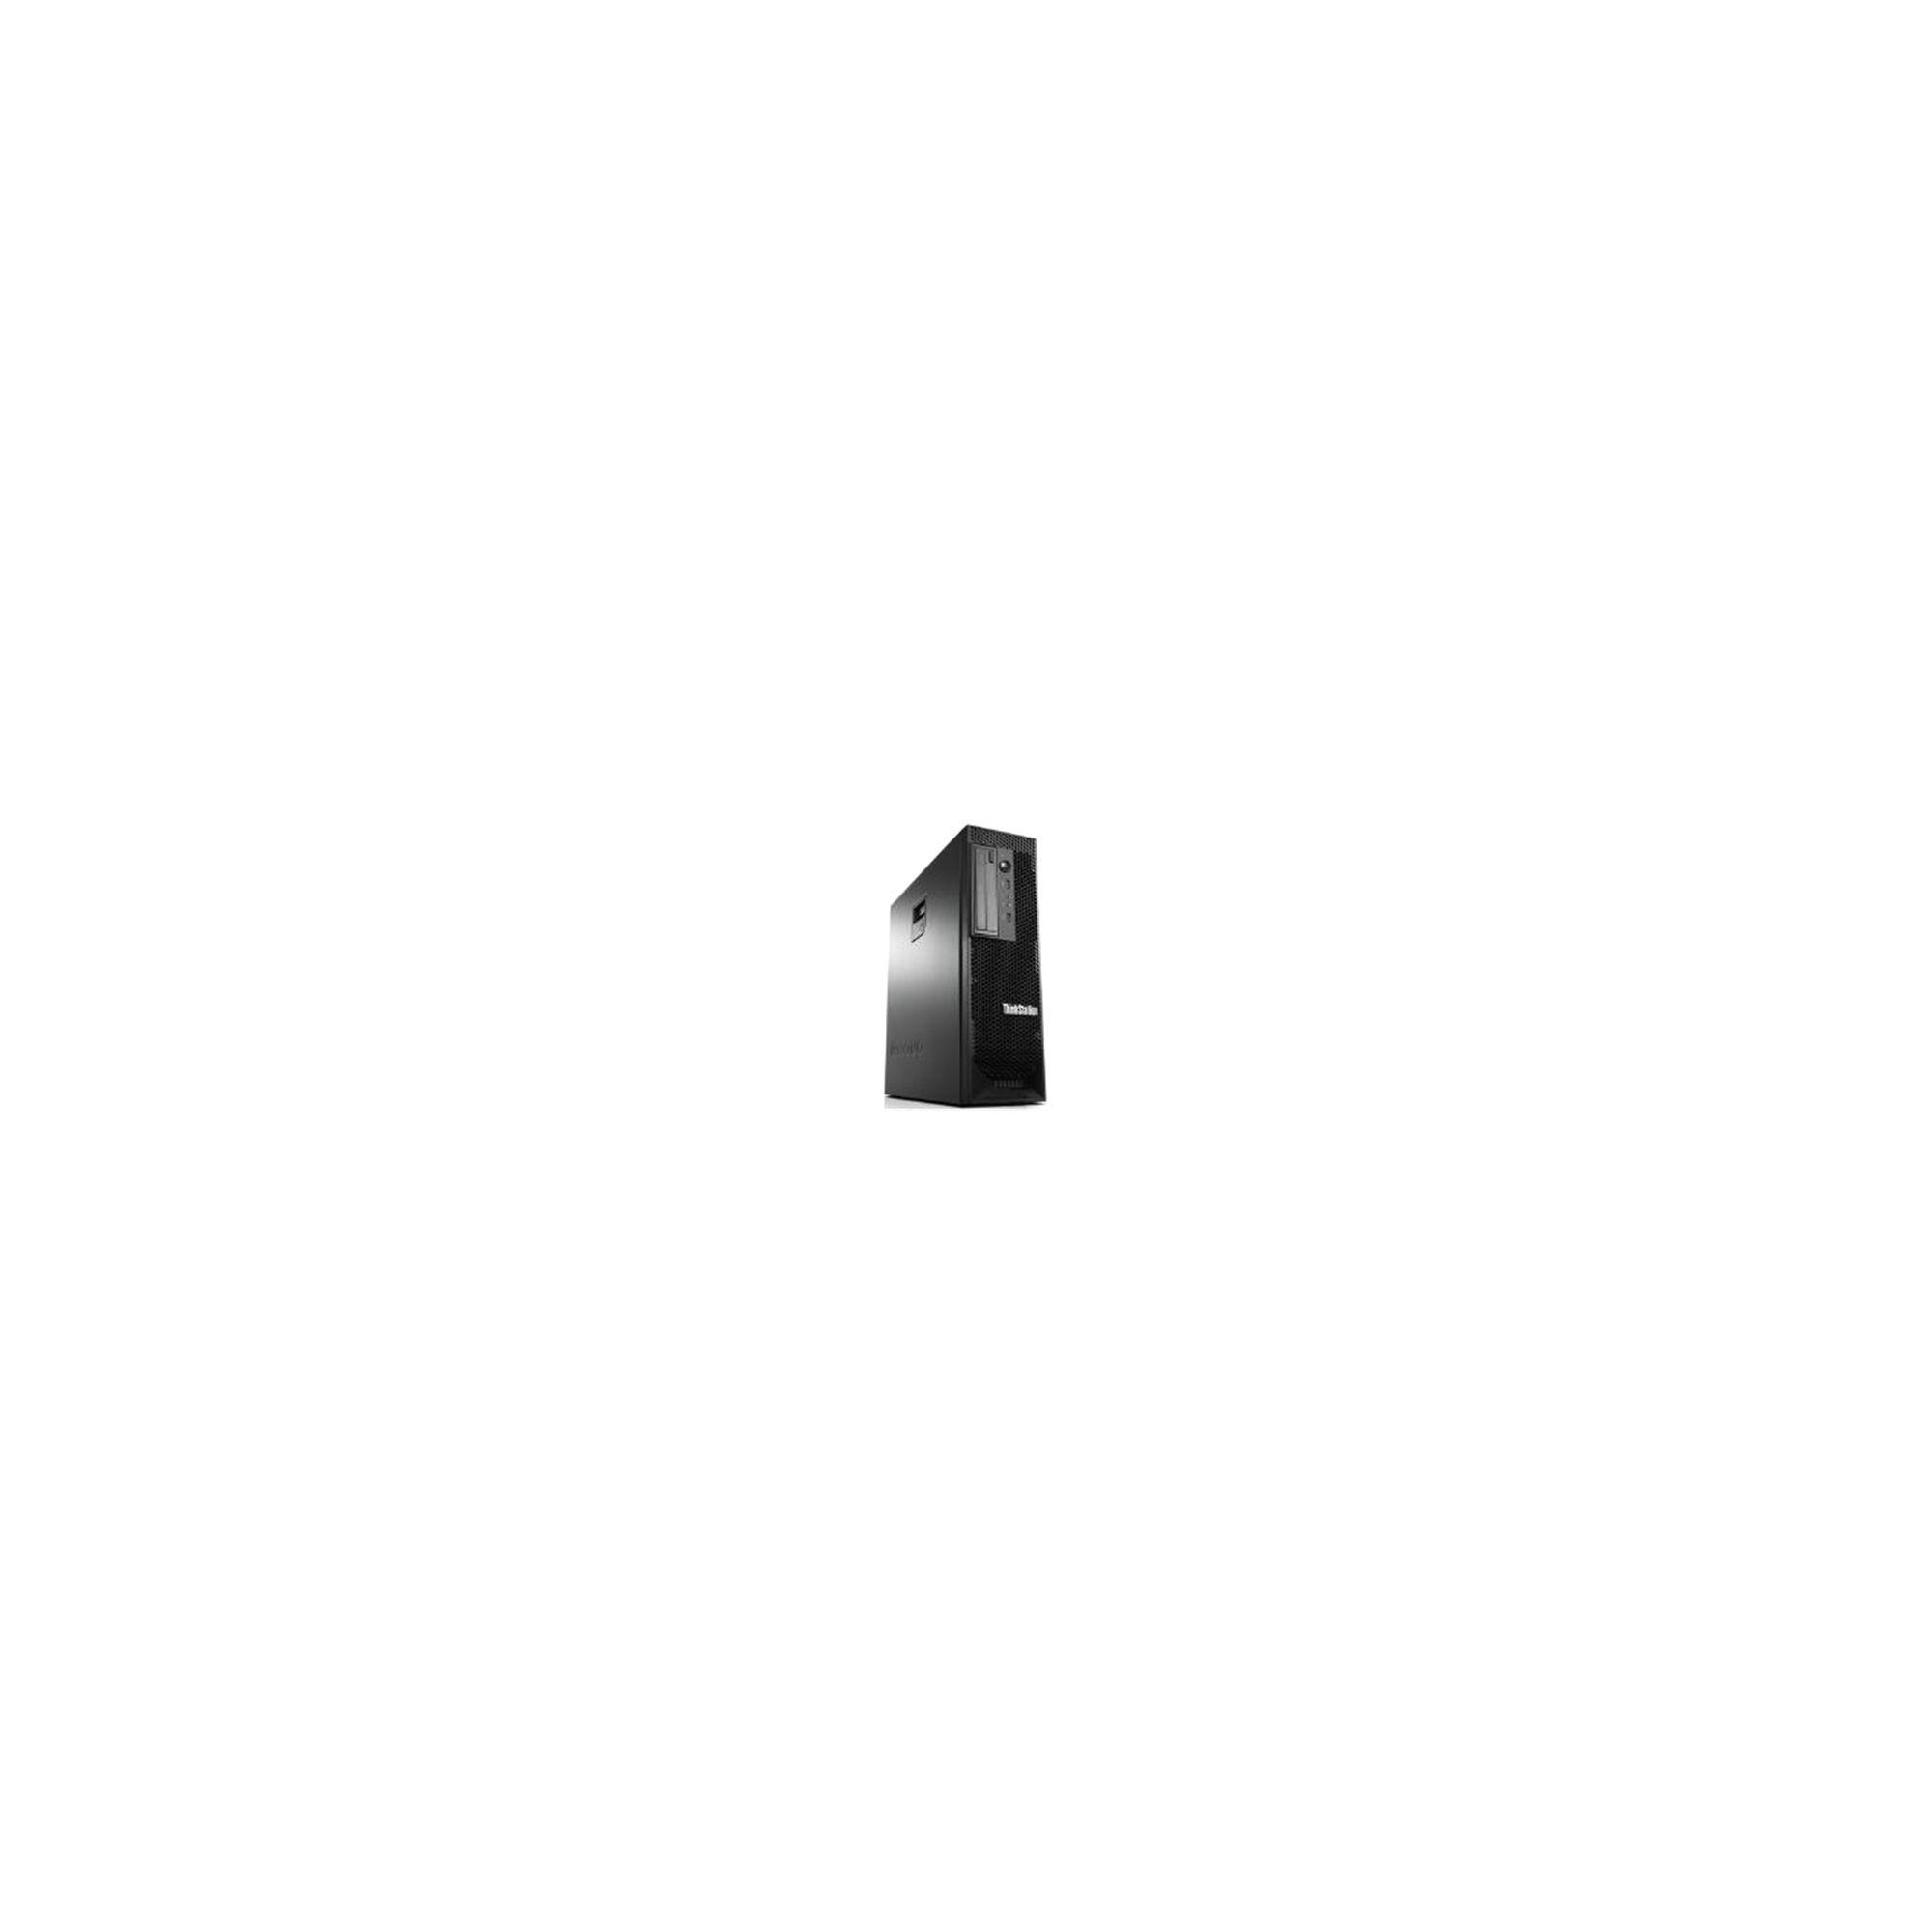 Lenovo ThinkStation C30 109728G Tower Workstation Xeon E5 (2620) 2.0GHz 8GB (4x2GB) 256GB SSD DVD?RW LAN Windows 7 Pro 64-bit (Black)